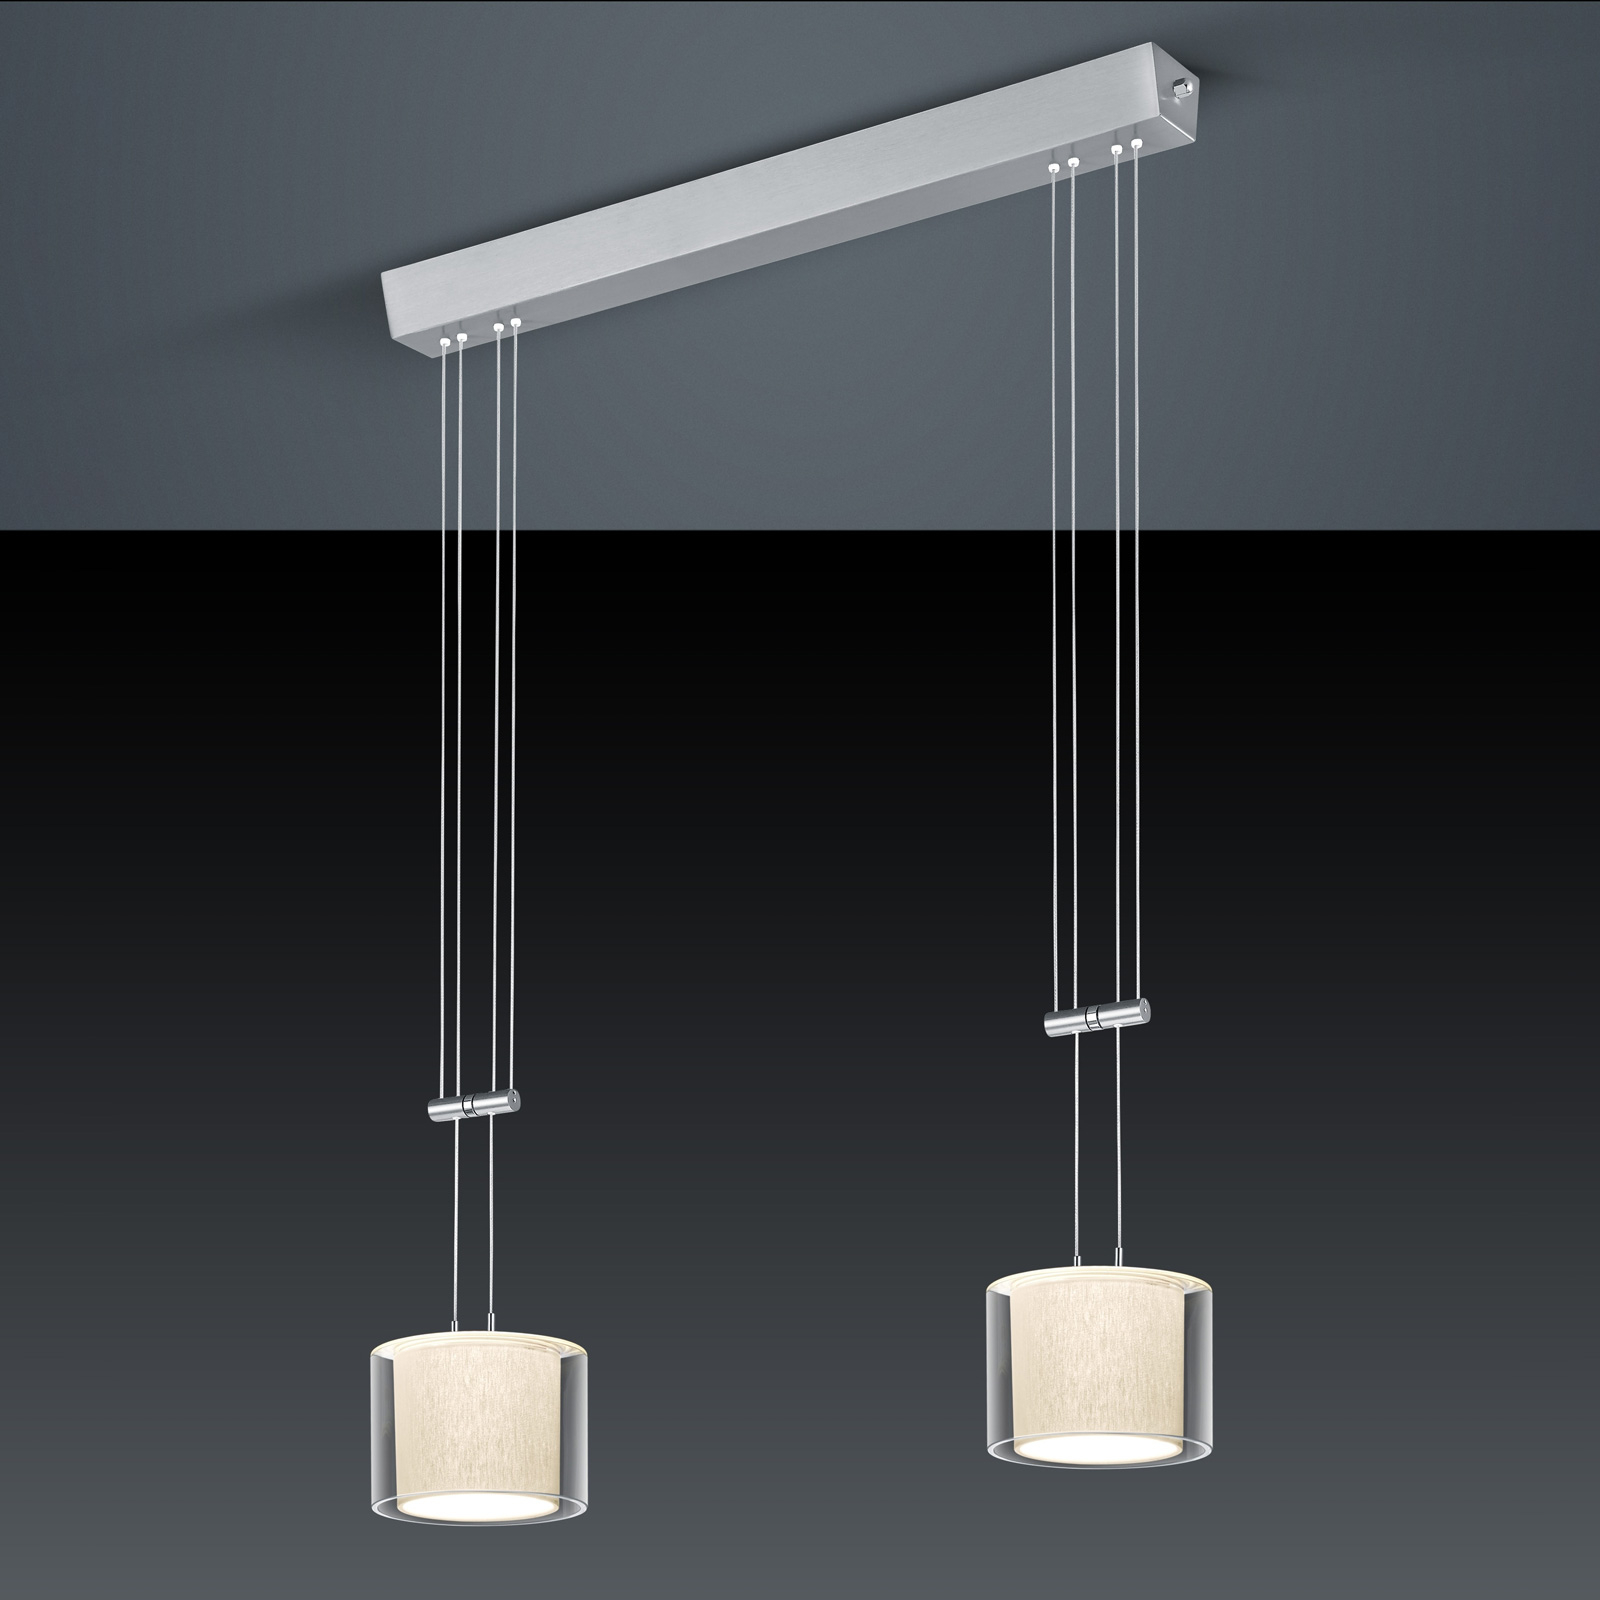 BANKAMP Cecil LED hanglamp, 2-lamps